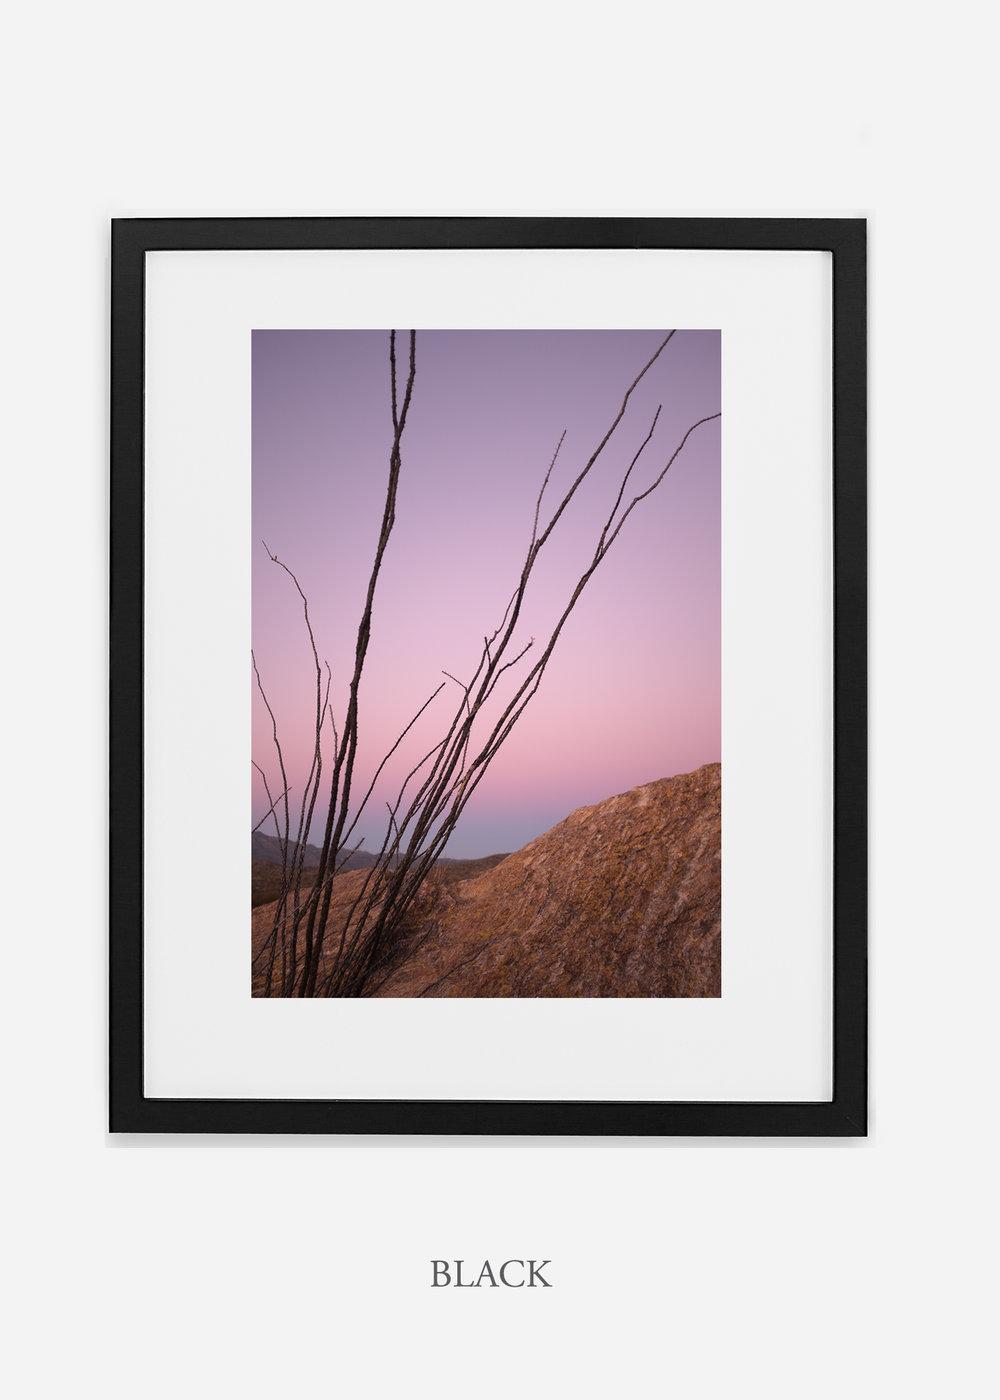 blackframe-saguaroNo.12-wildercalifornia-art-wallart-cactusprint-homedecor-prints-arizona-botanical-artwork-interiordesign.jpg